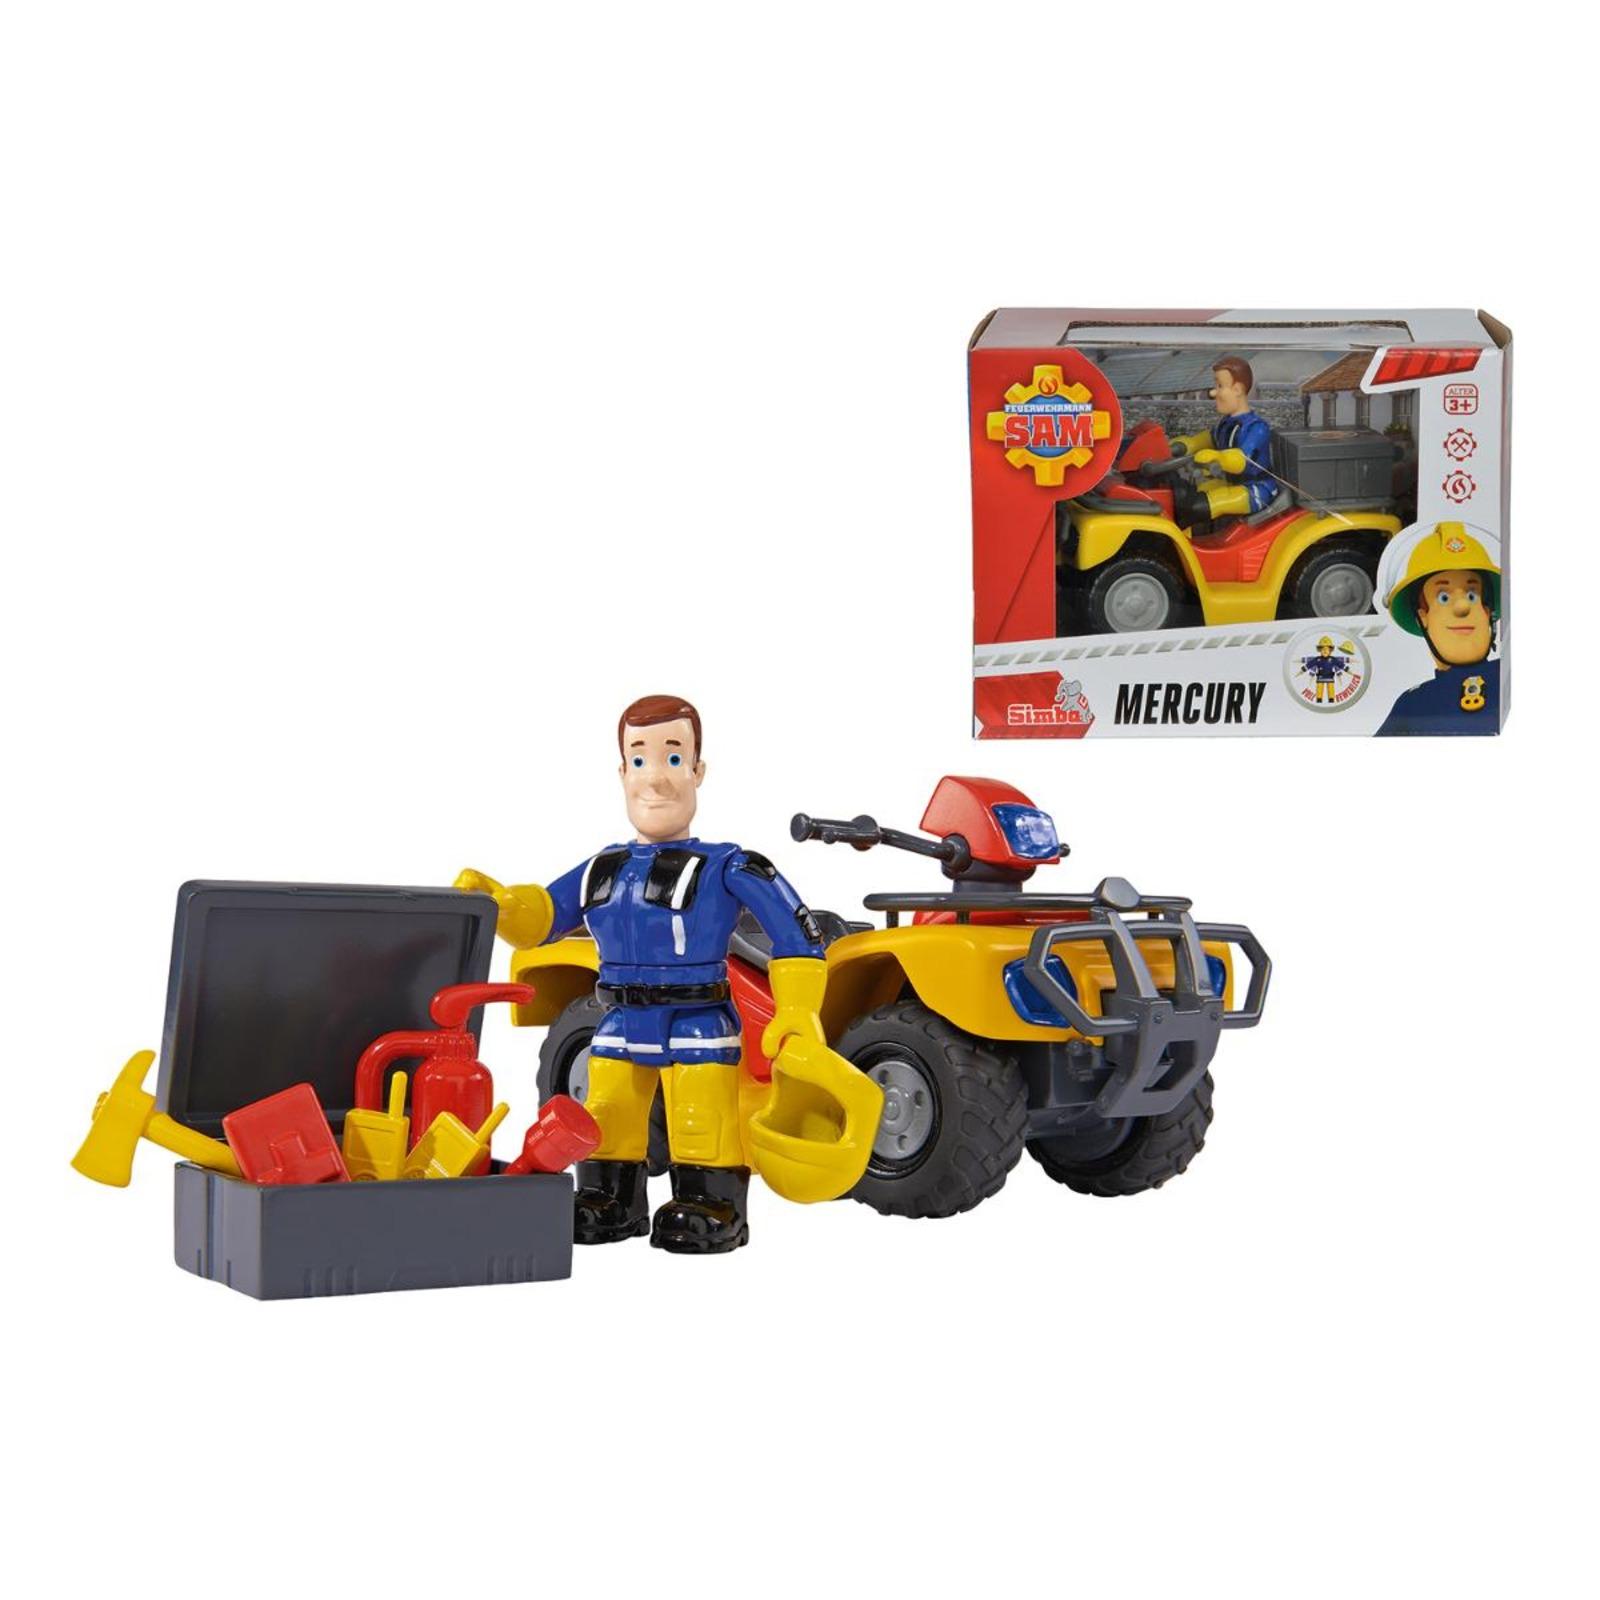 Simba Toys Fireman Sam - Quadbike Mercury